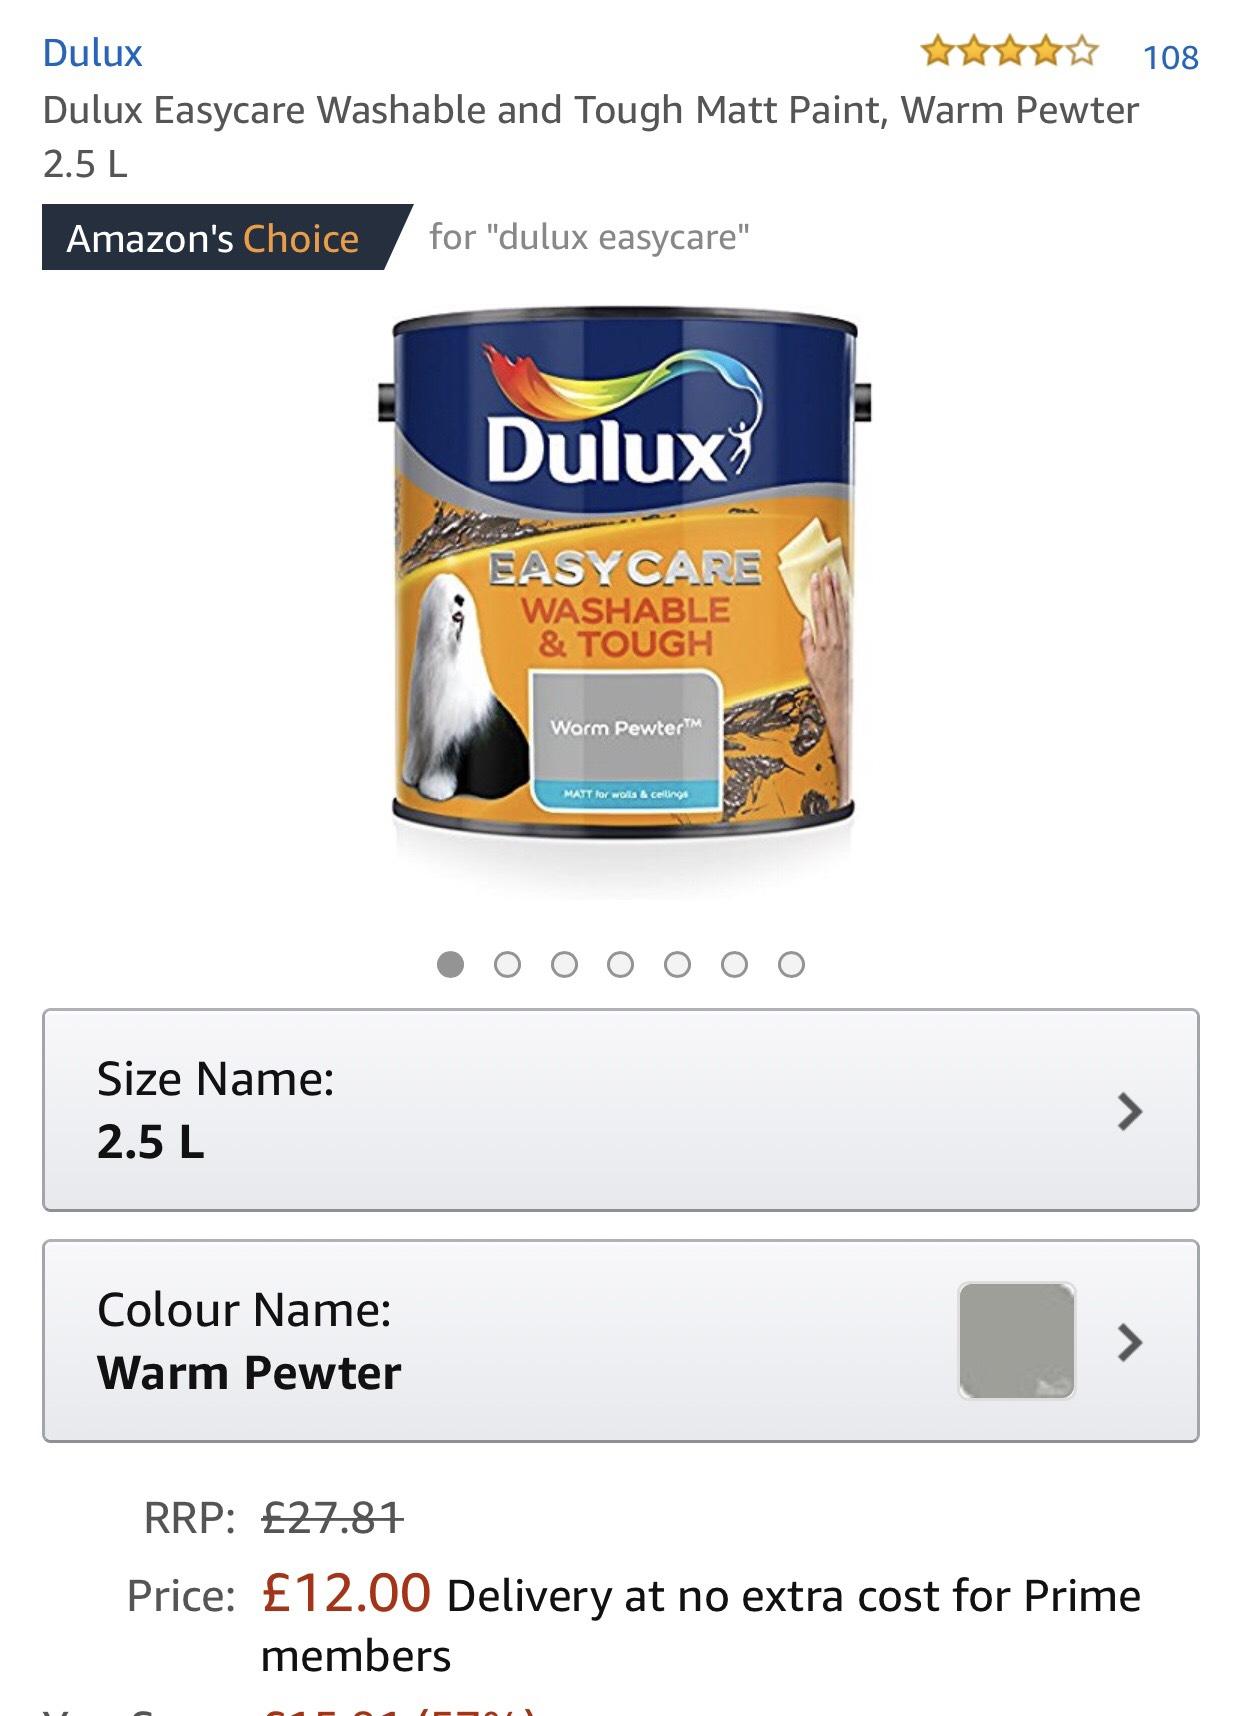 Various Dulux easycare paint £12 prime / £16.49 non prime on Amazon